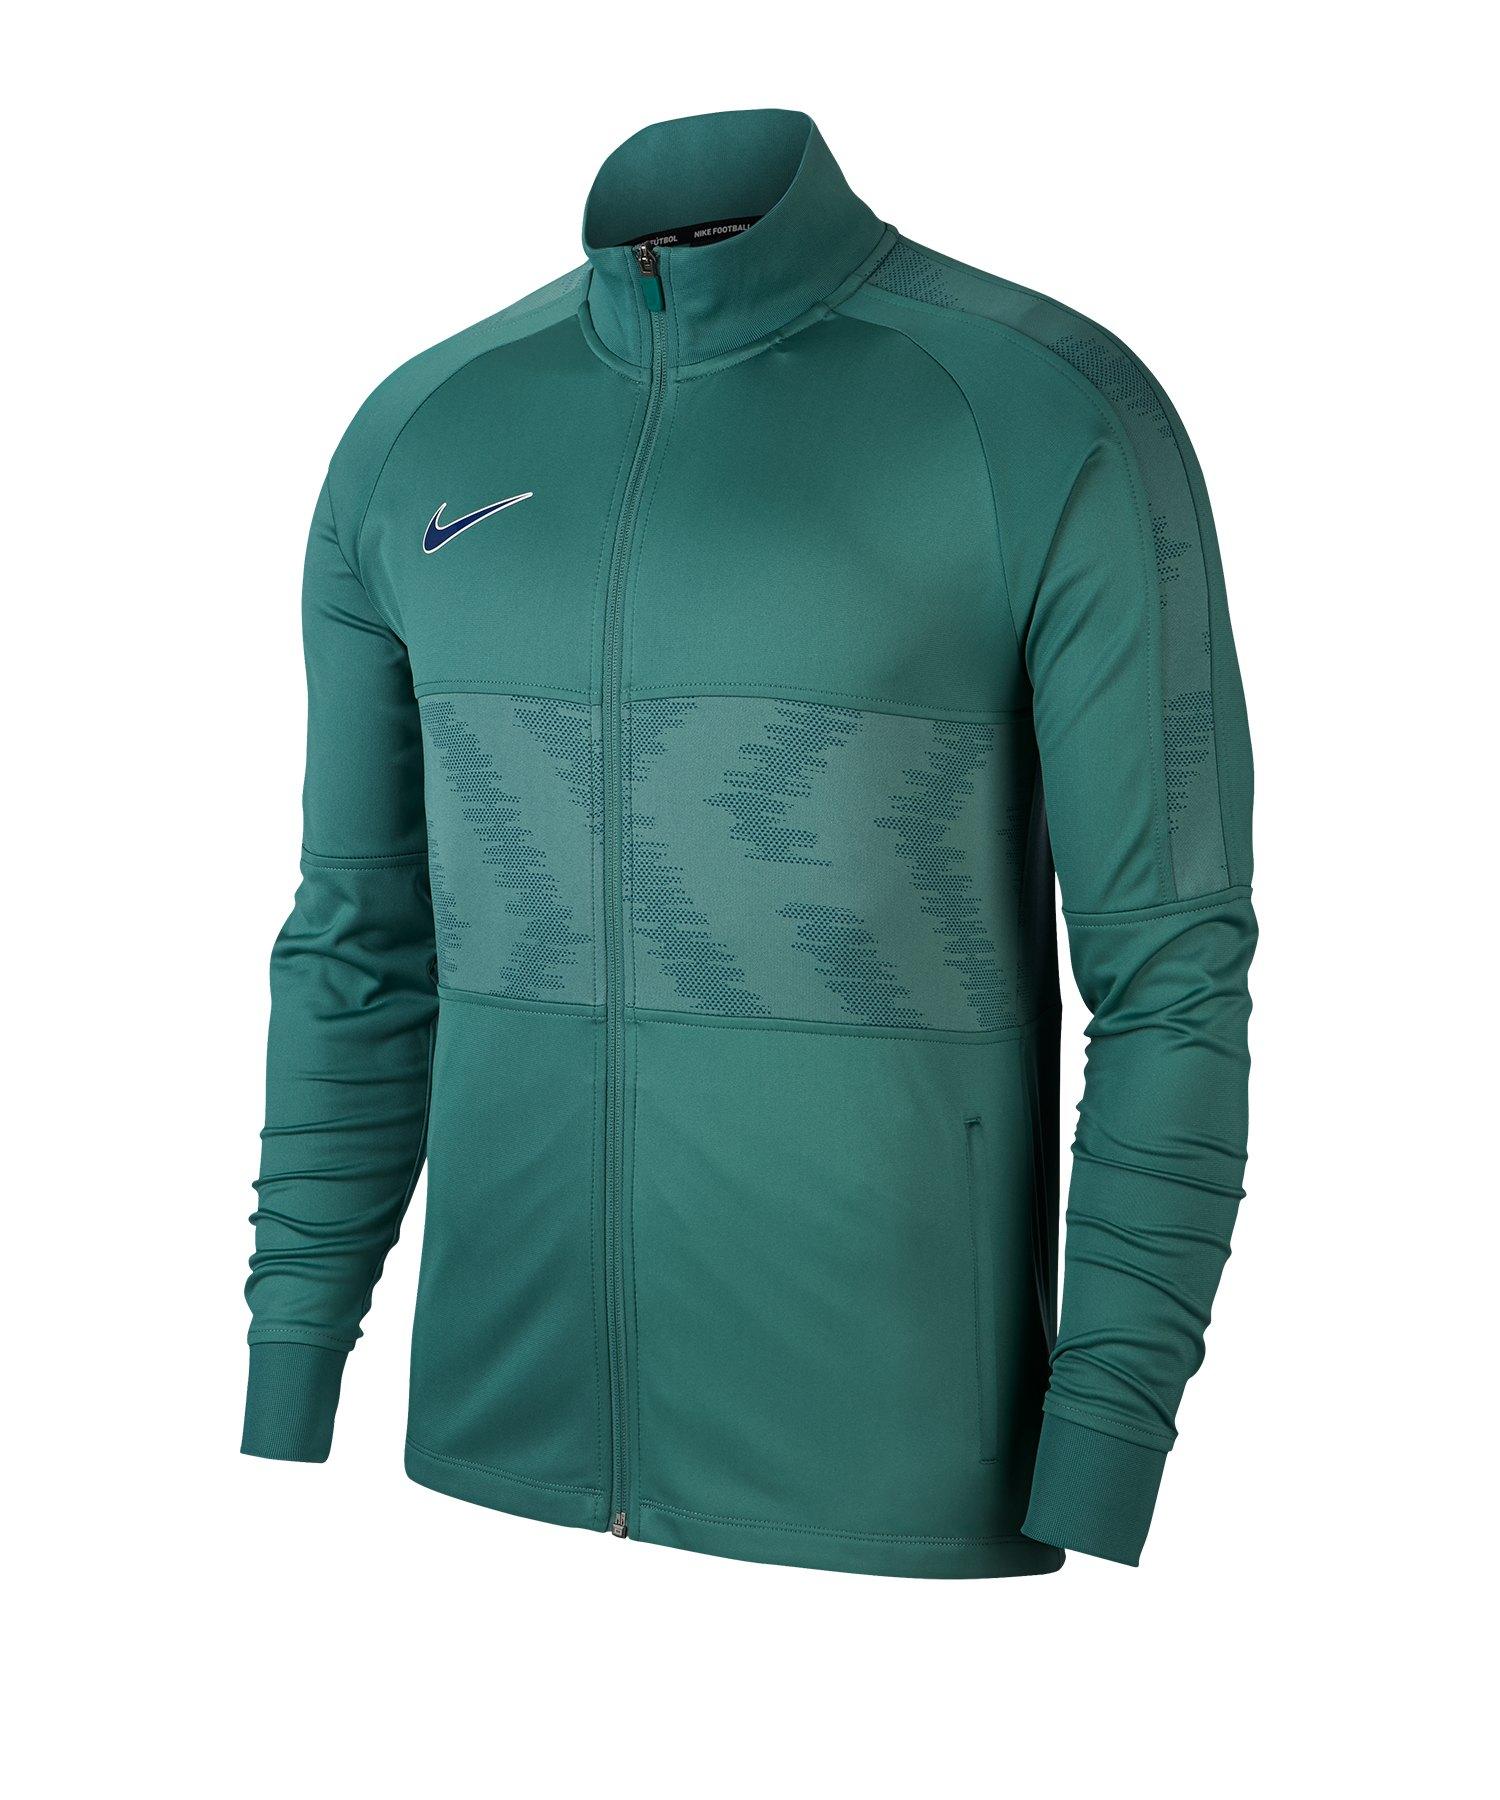 Nike Dri-FIT Strike Trainingsjacke Grün F362 - gruen